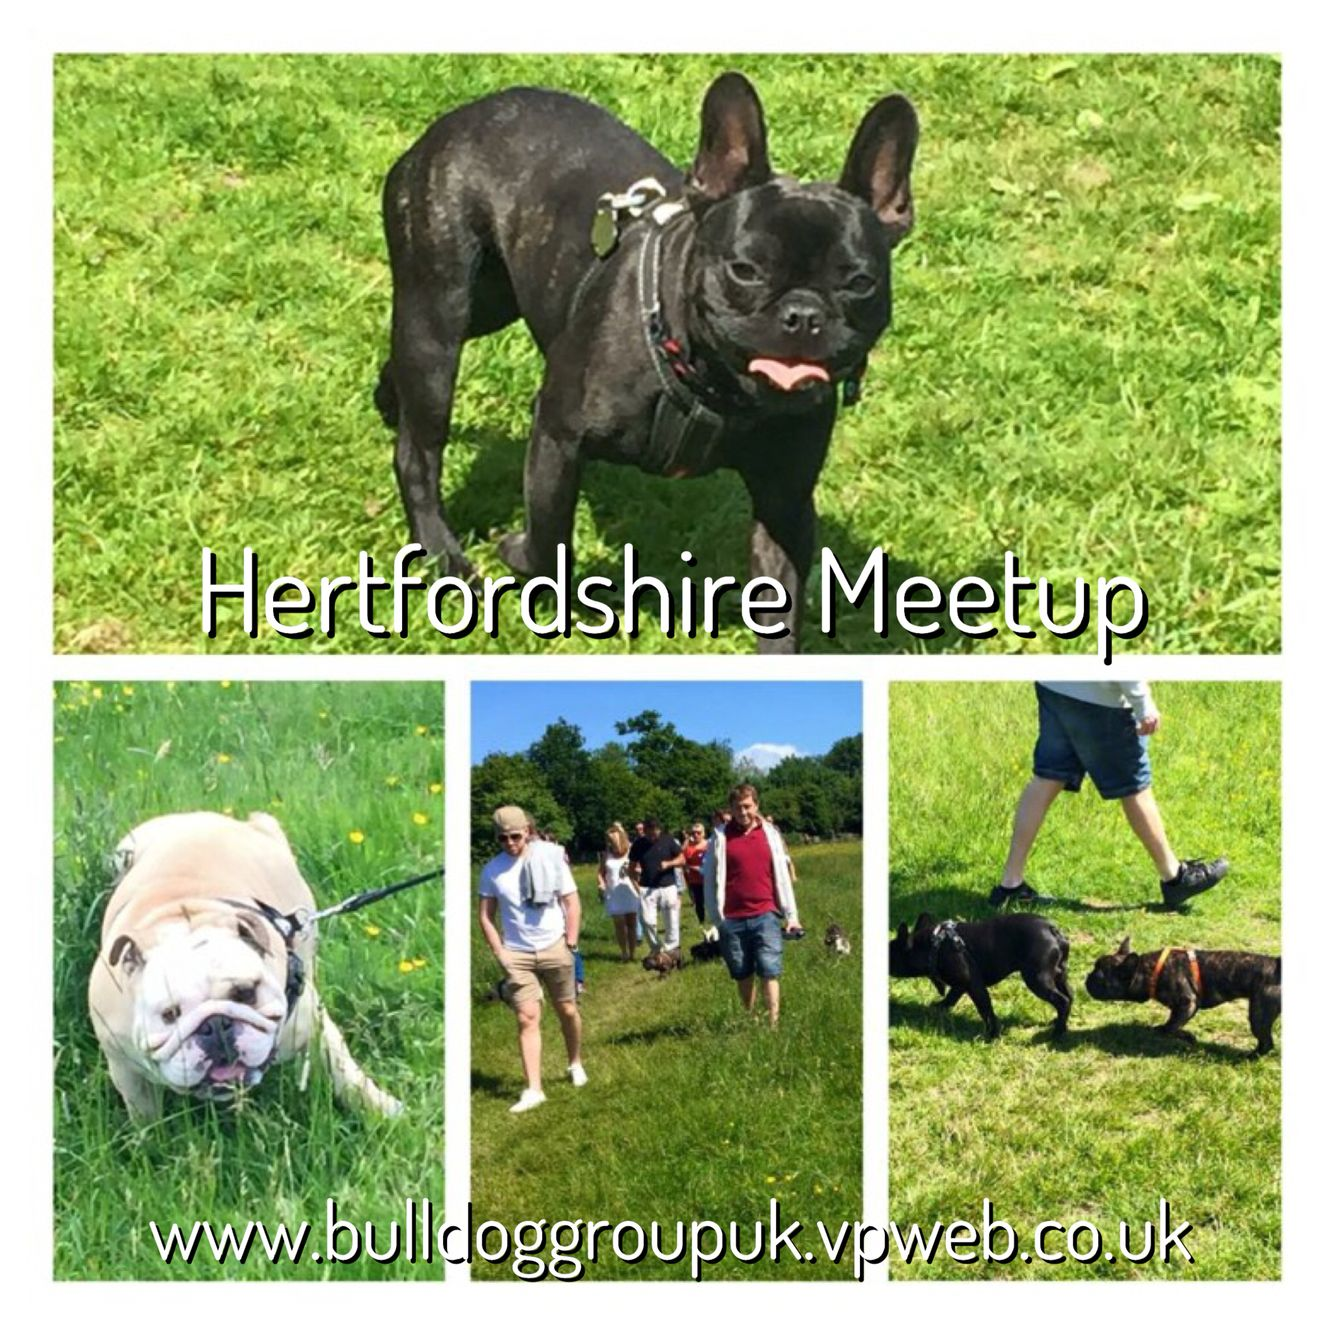 Hertfordshire Meetup French bulldog, Animals, Bulldog